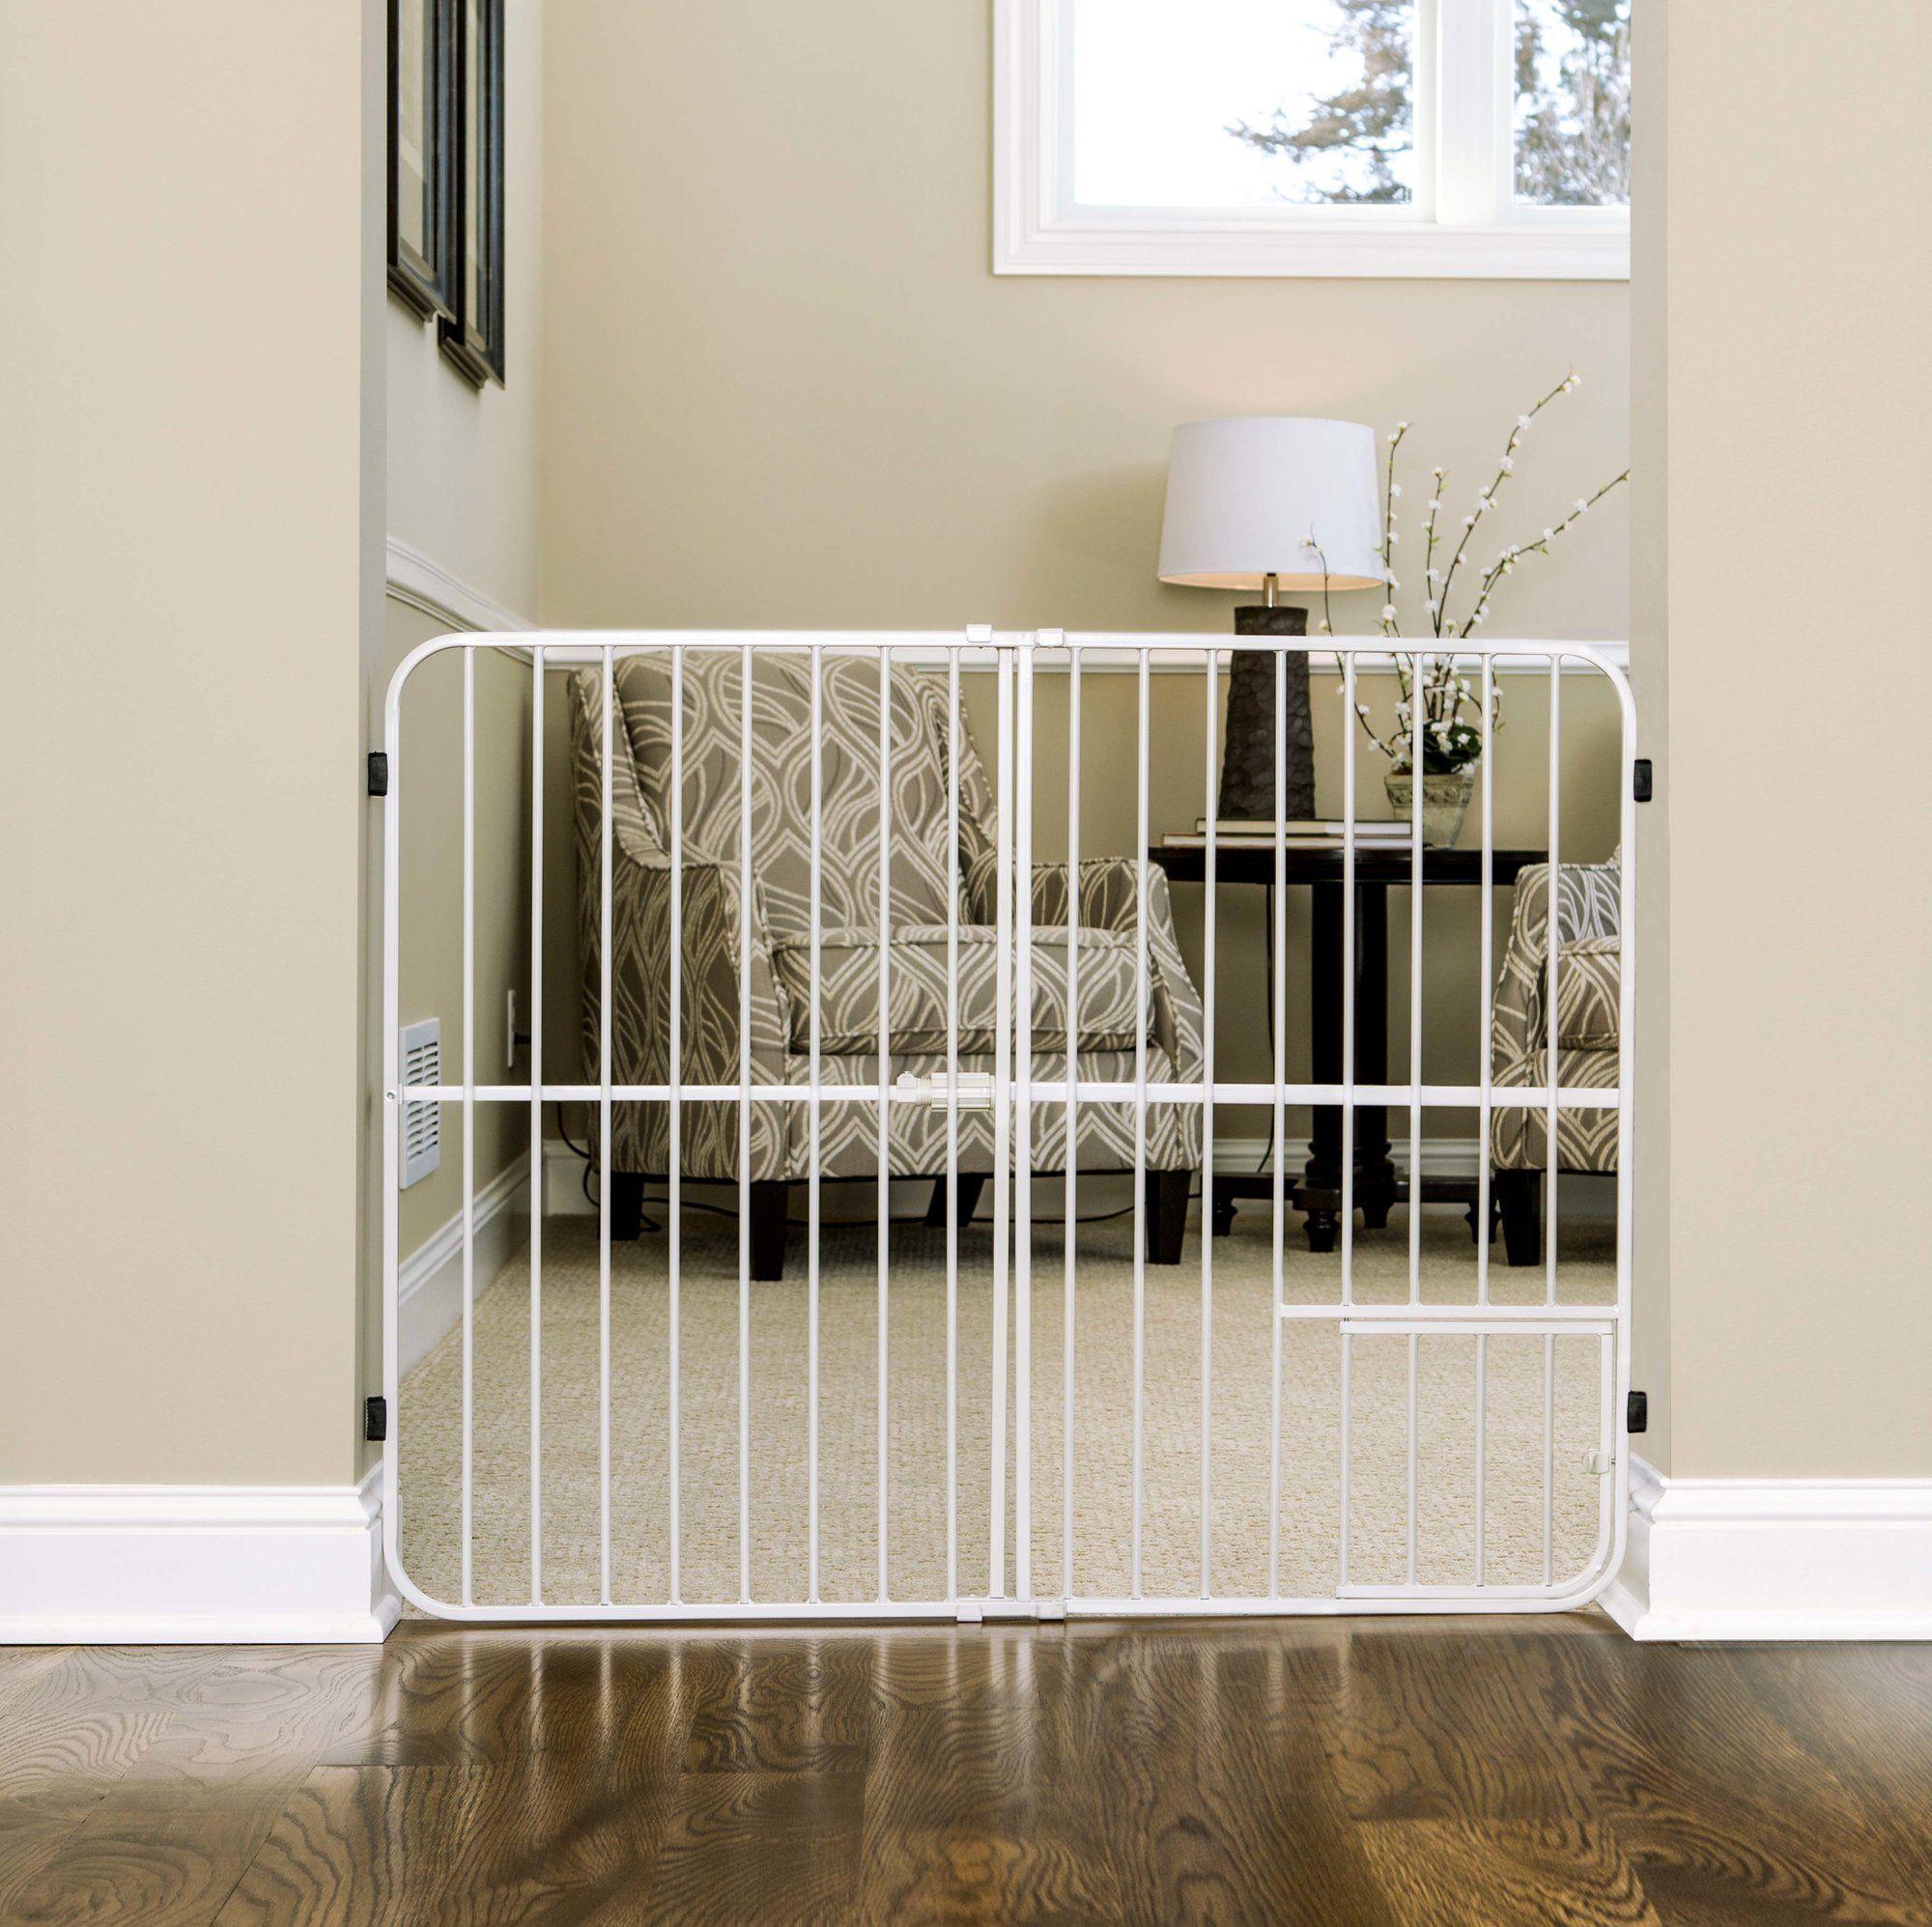 Expandable Pressure Mounted Pet Gate Pet gate, Pet gate